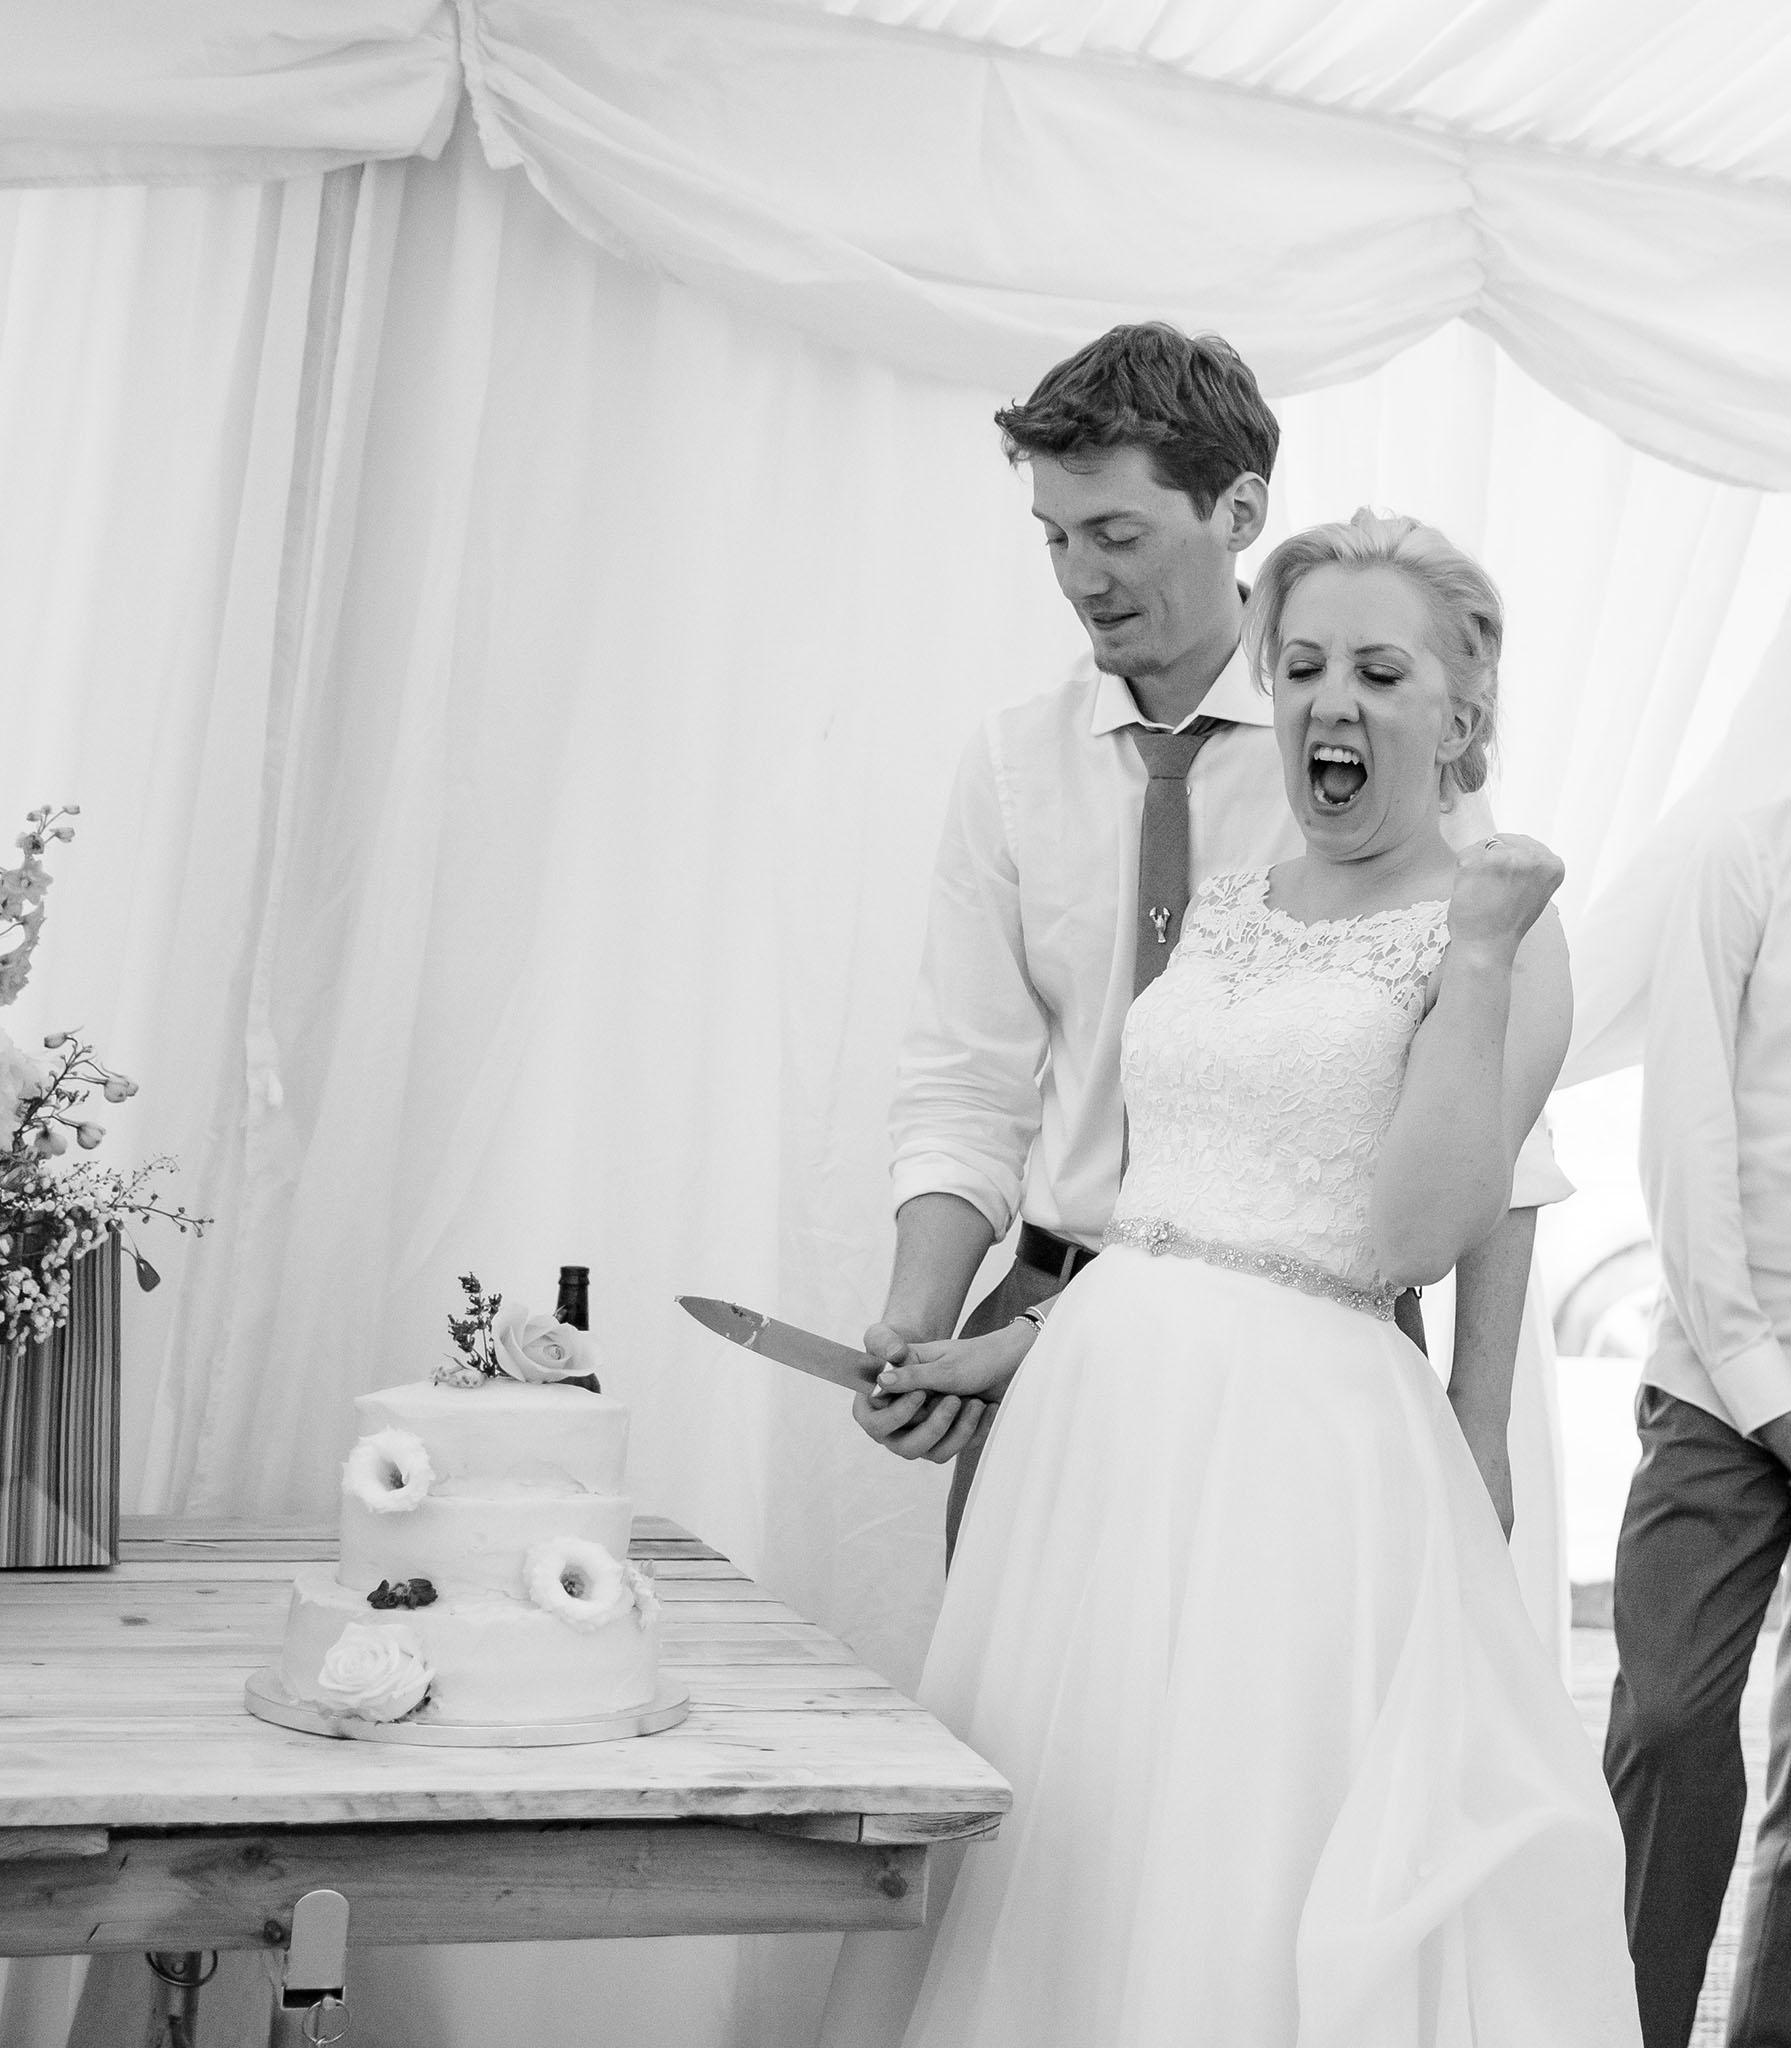 elizabethgphotography_kingslangley_hertfordshire_fineart_wedding_pottersbar_matt_katie_pegg_43.jpg